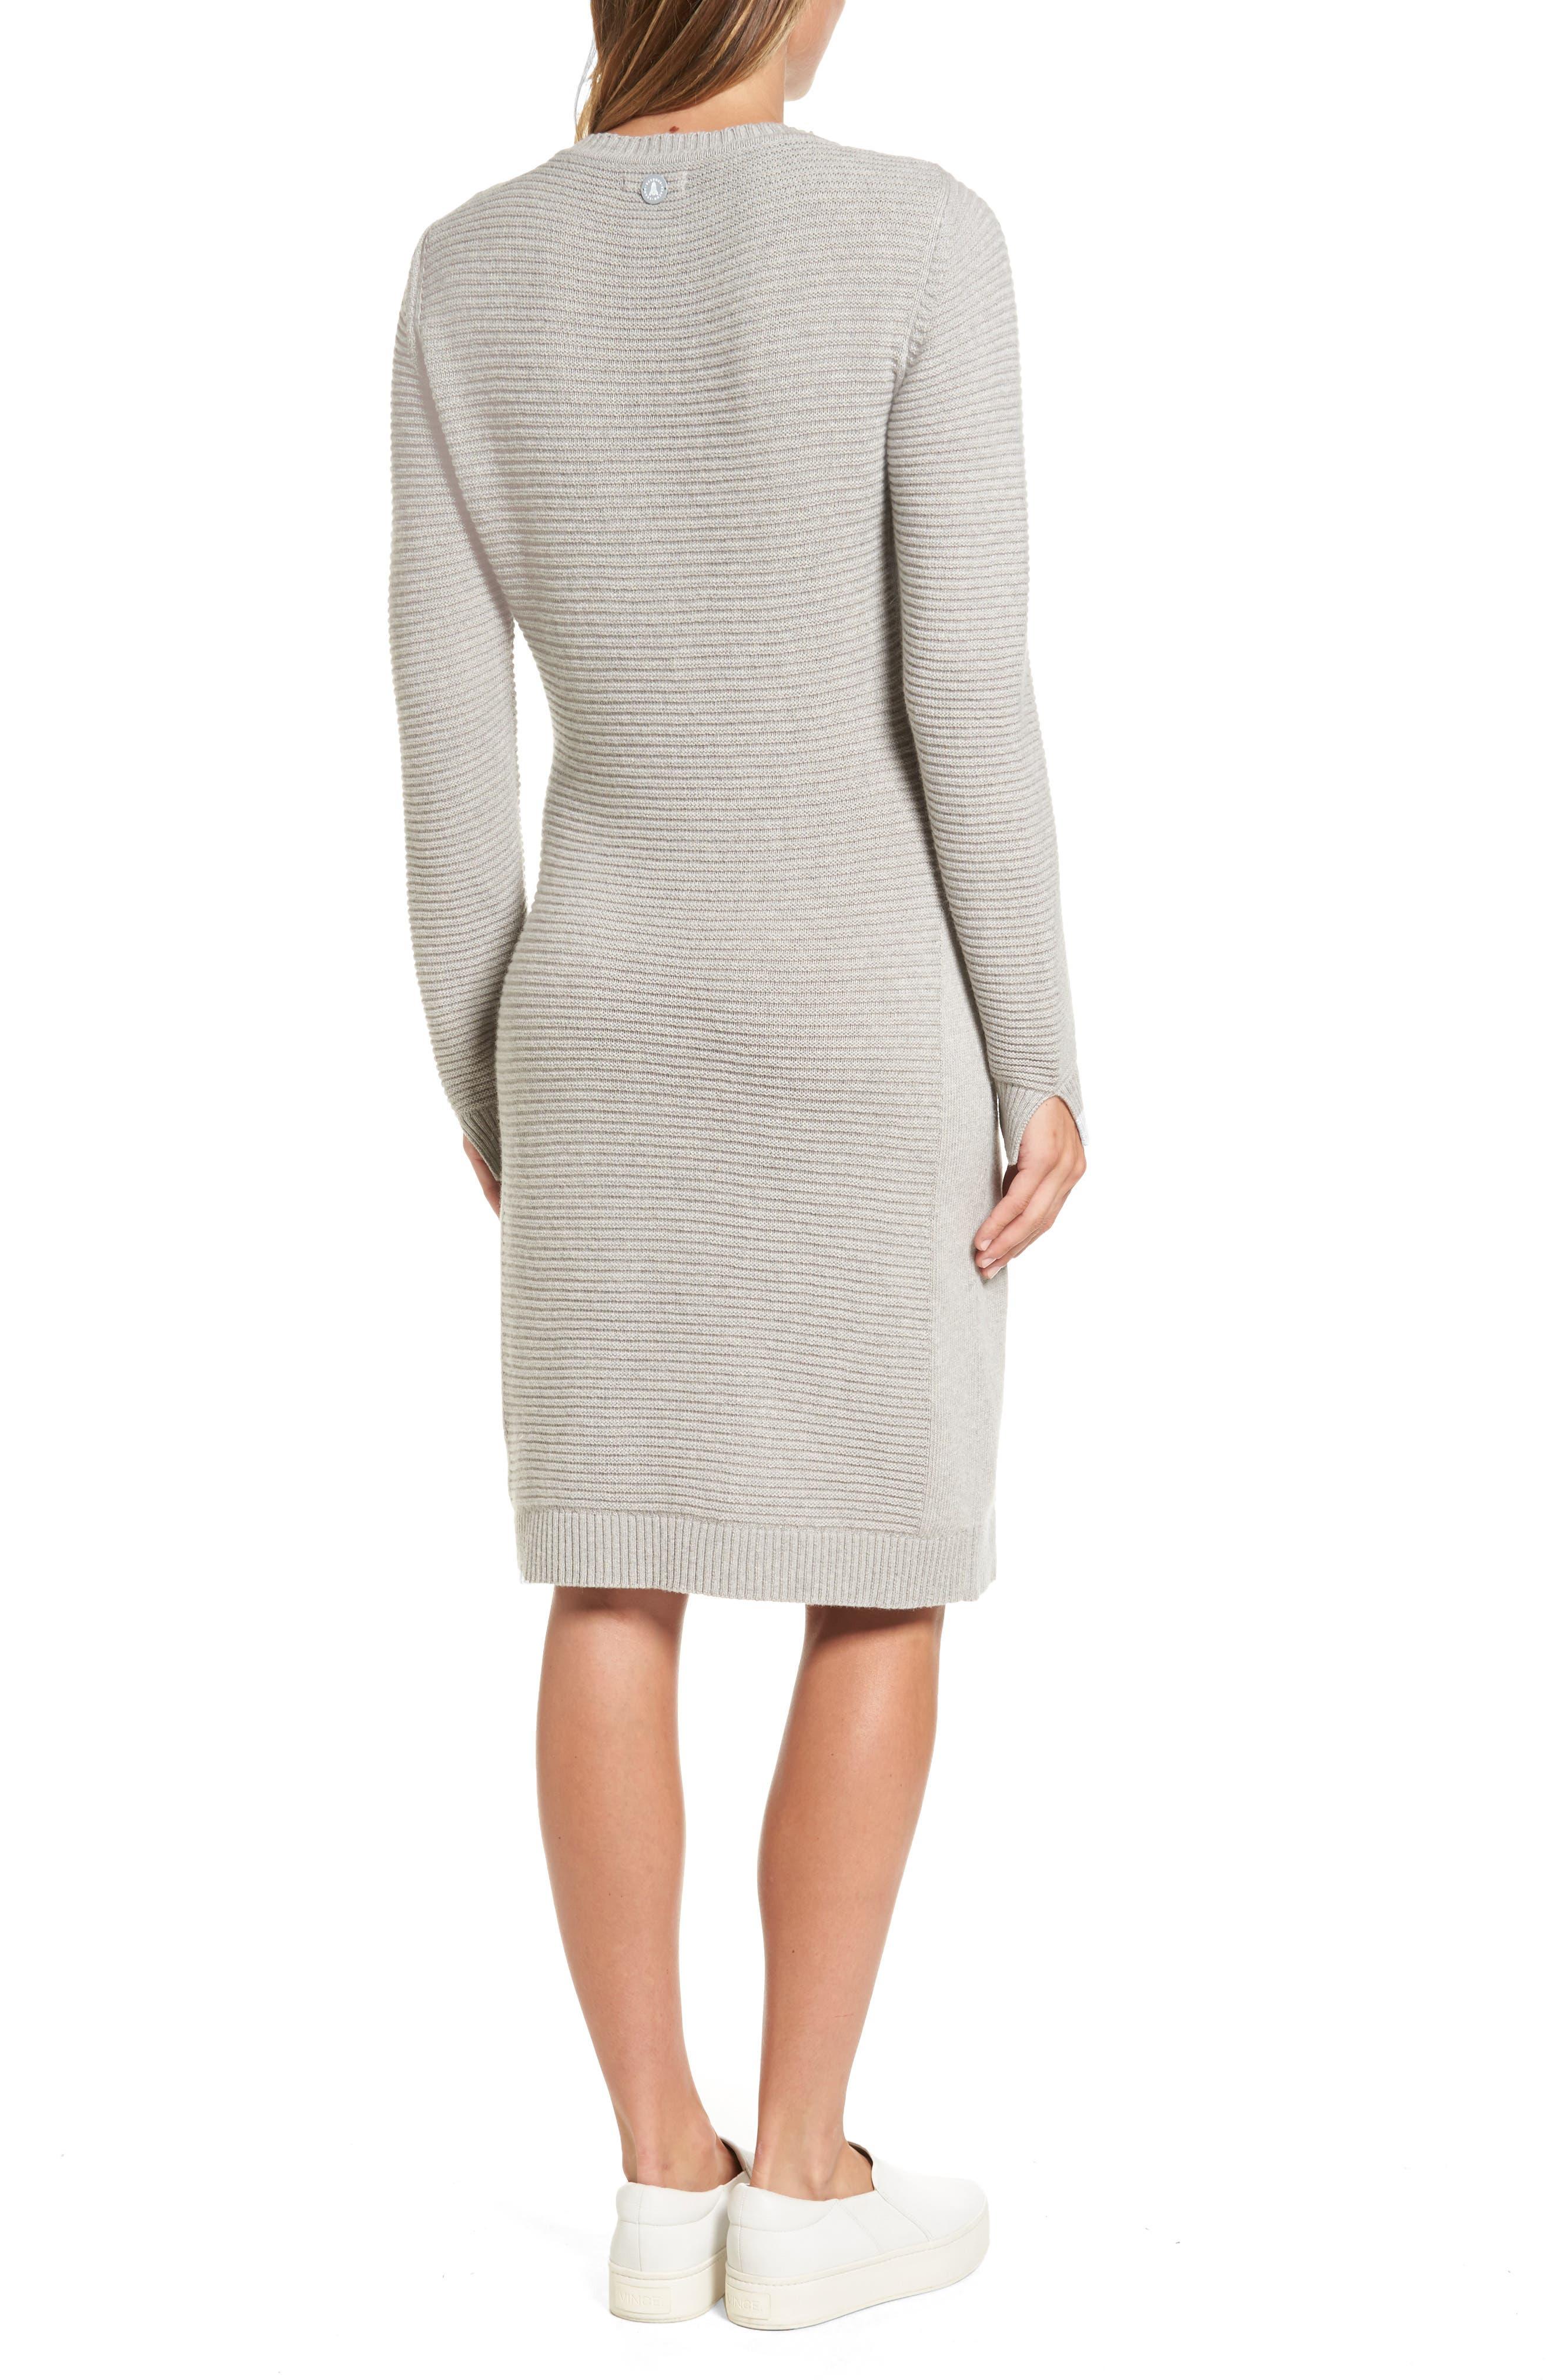 Emmanuel Cable Knit Sweater Dress,                             Alternate thumbnail 2, color,                             050